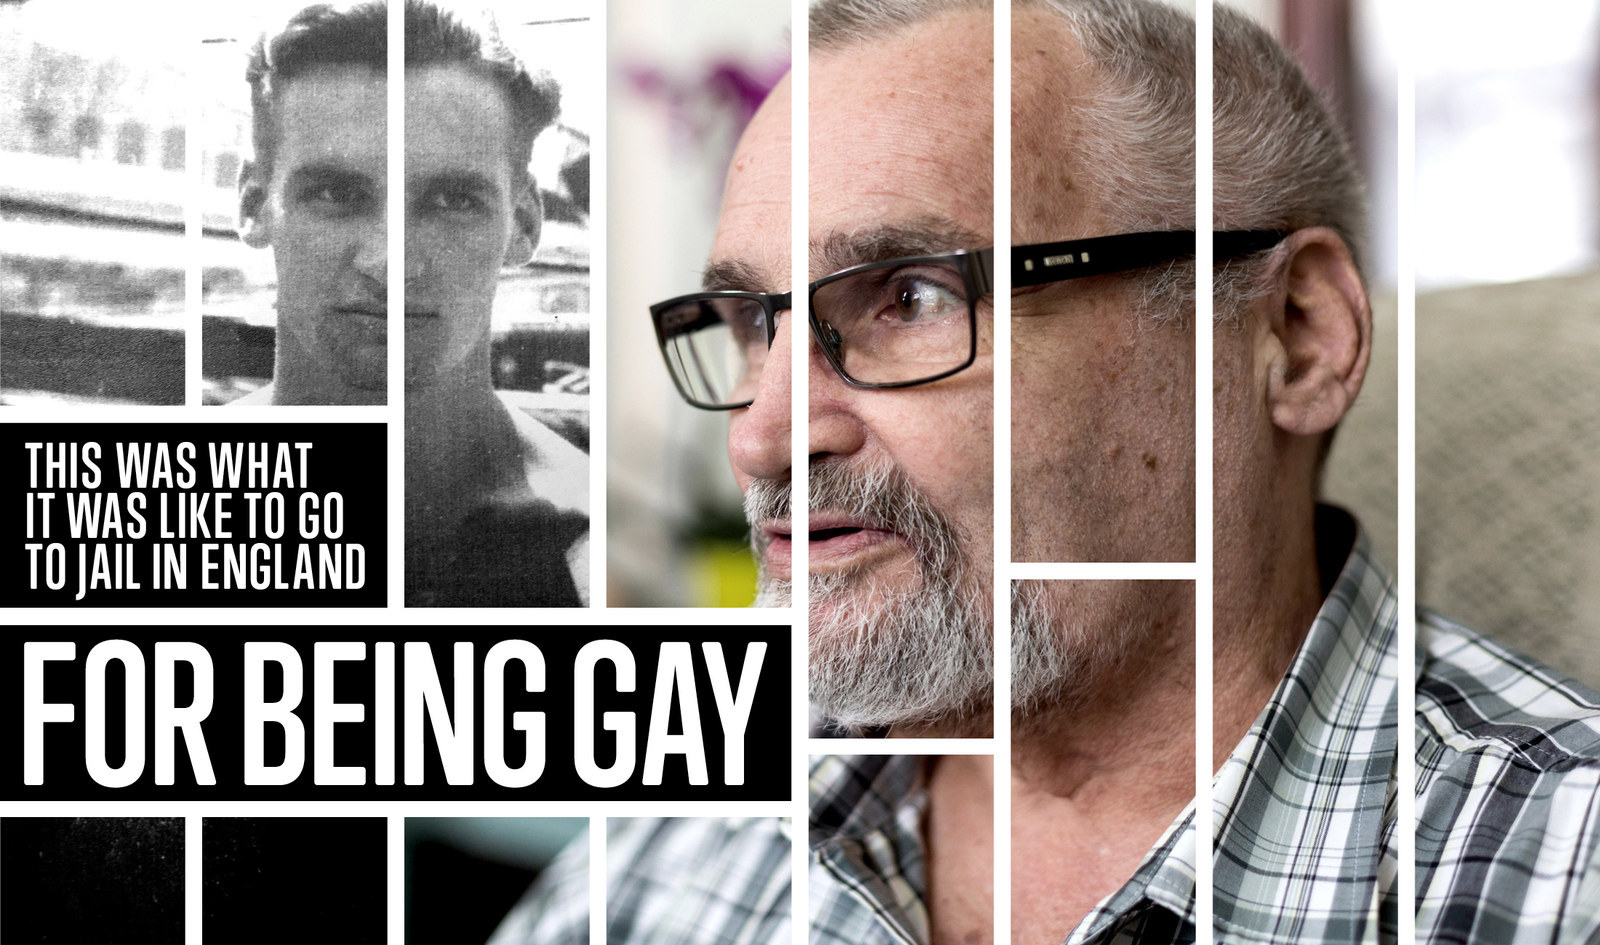 Homosexuals in prison